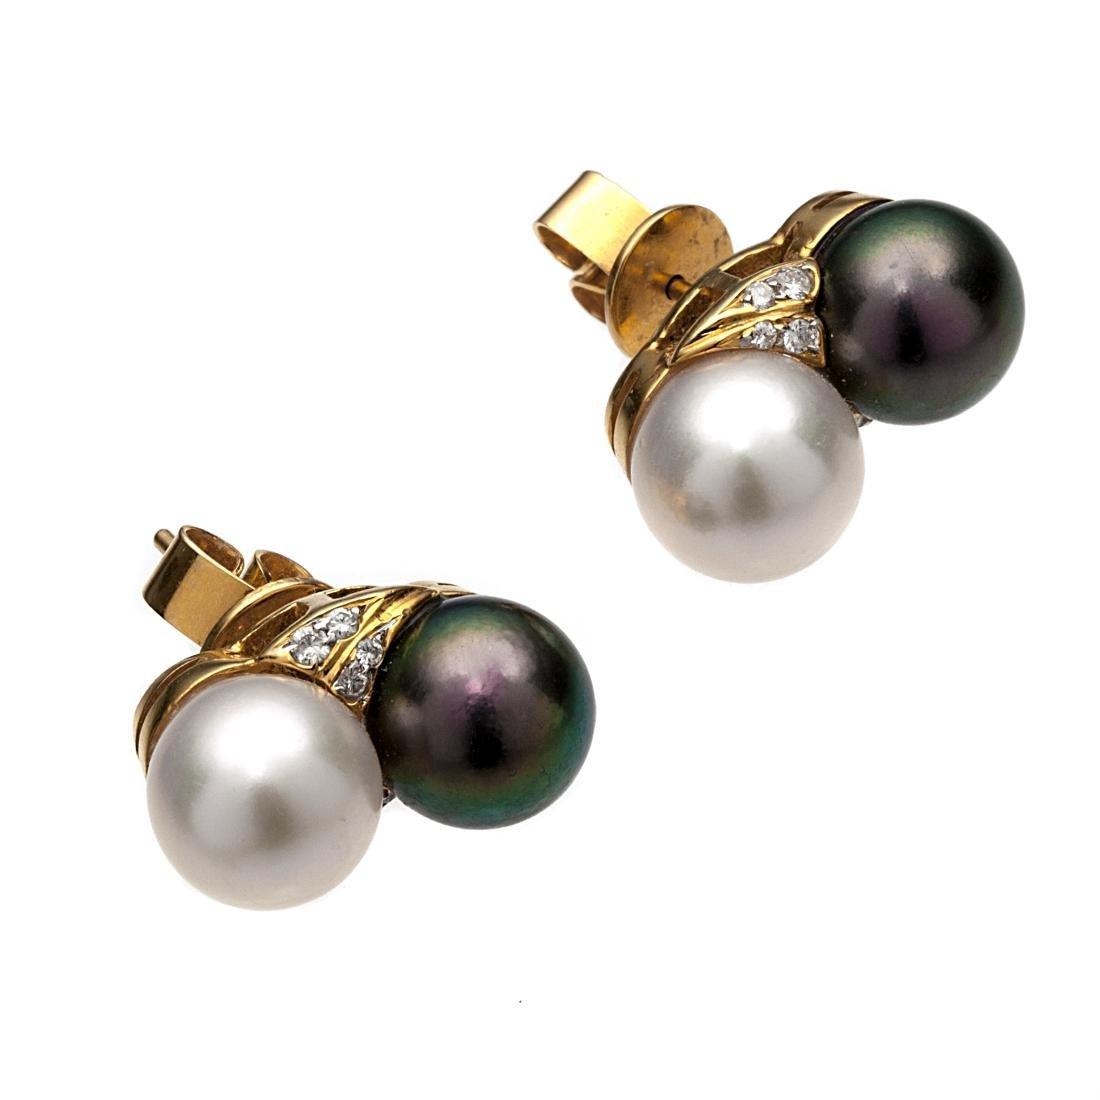 A pair of diamond, cultured pearl, 18k earrings